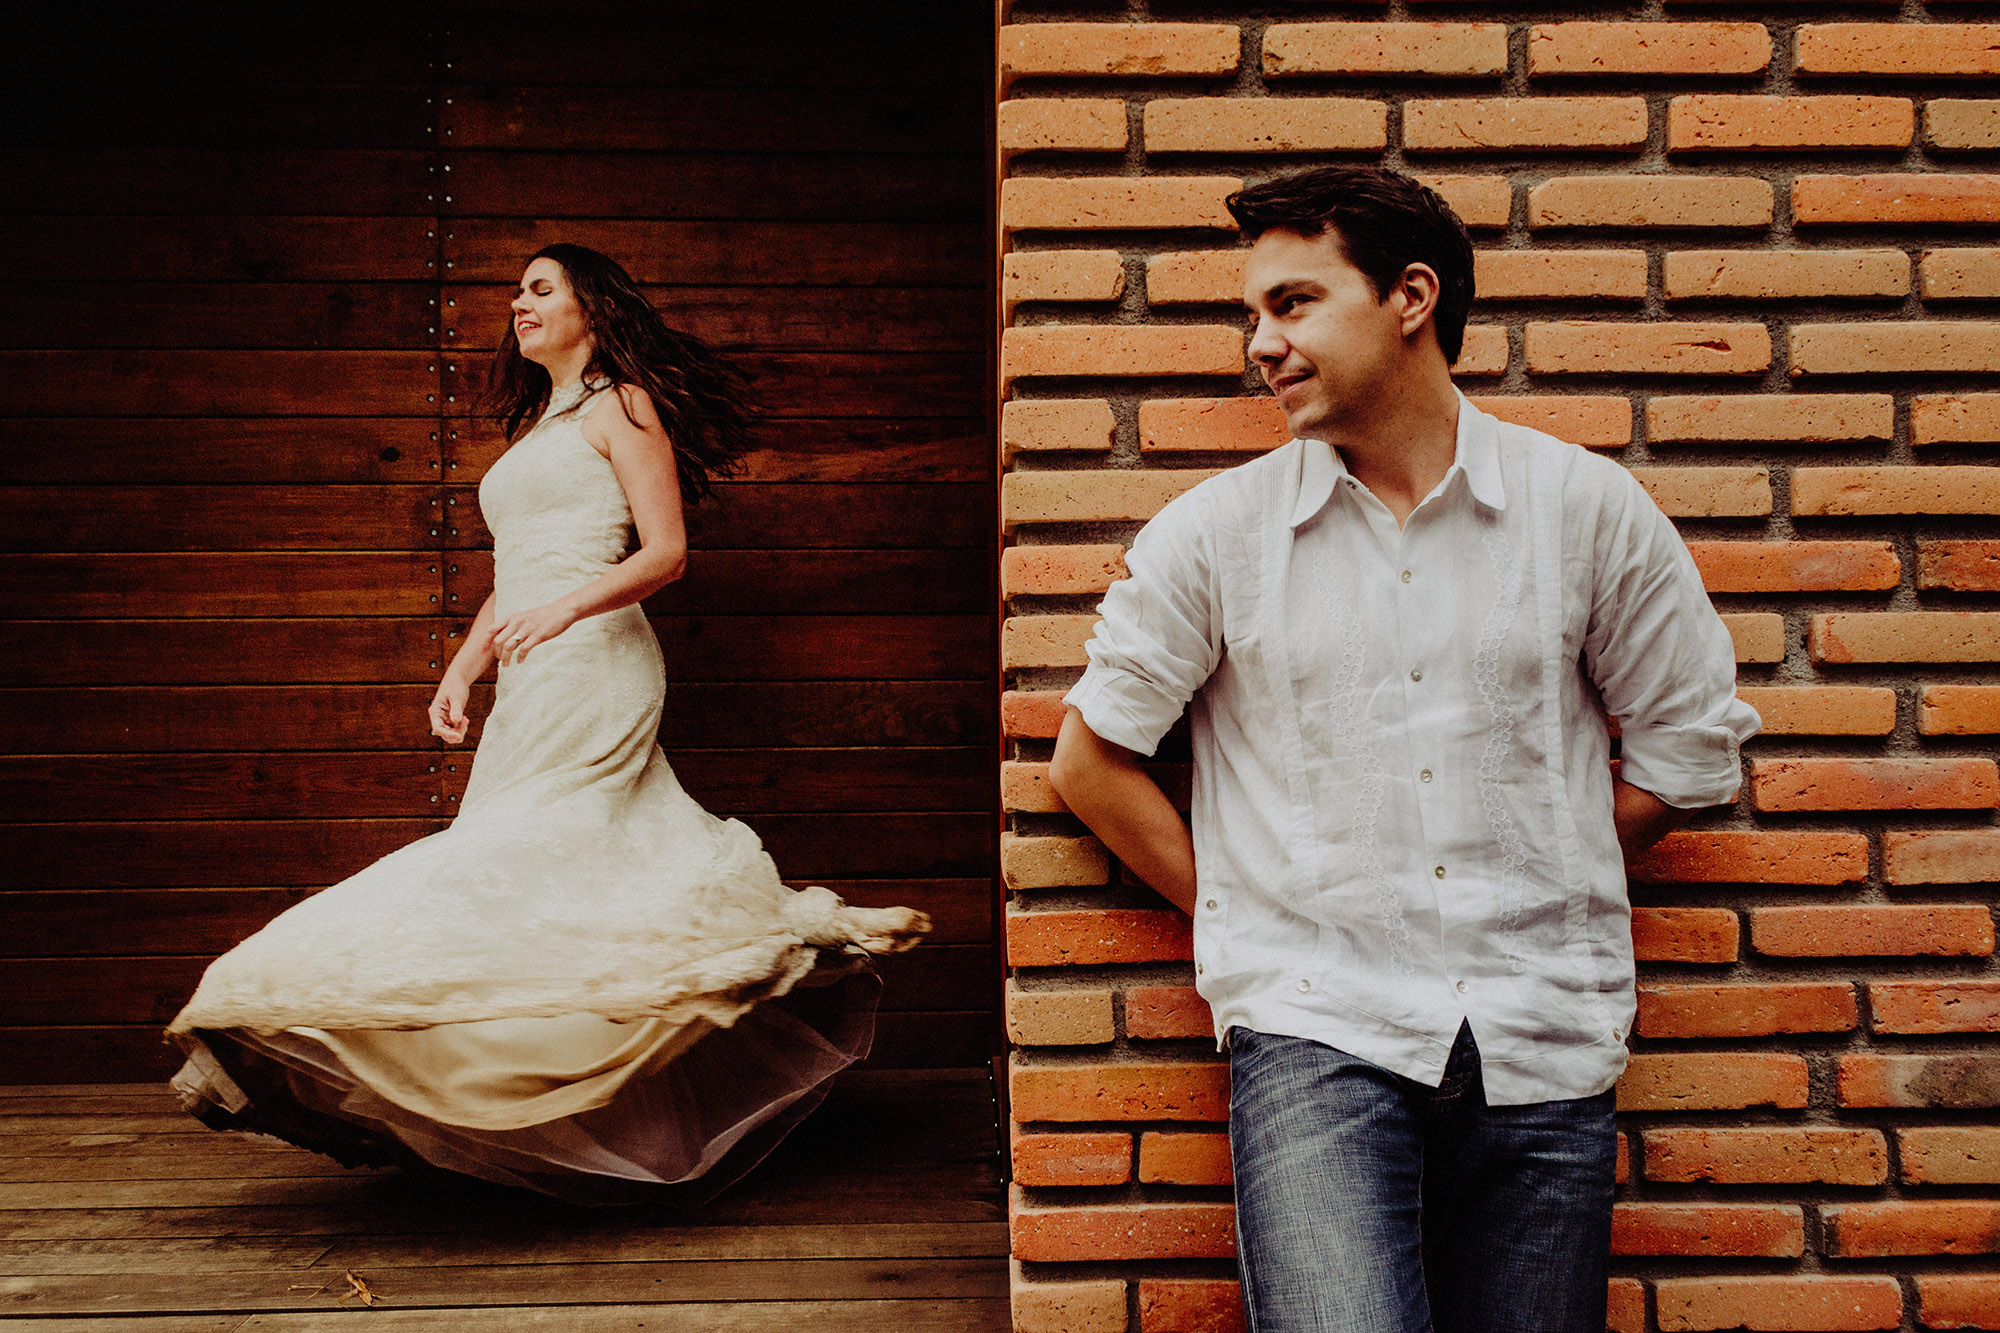 fer juan luis trash the dress fotografo de bodas 23.jpg